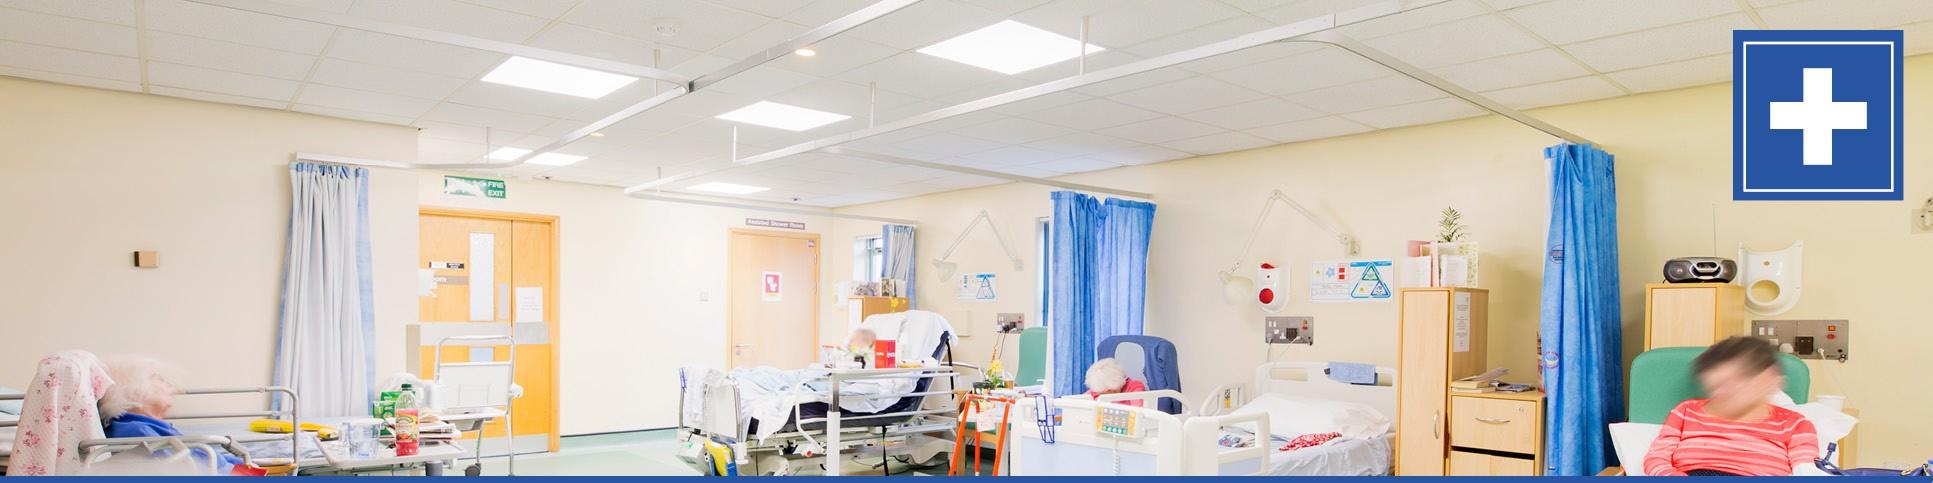 Lighting for Healthcare